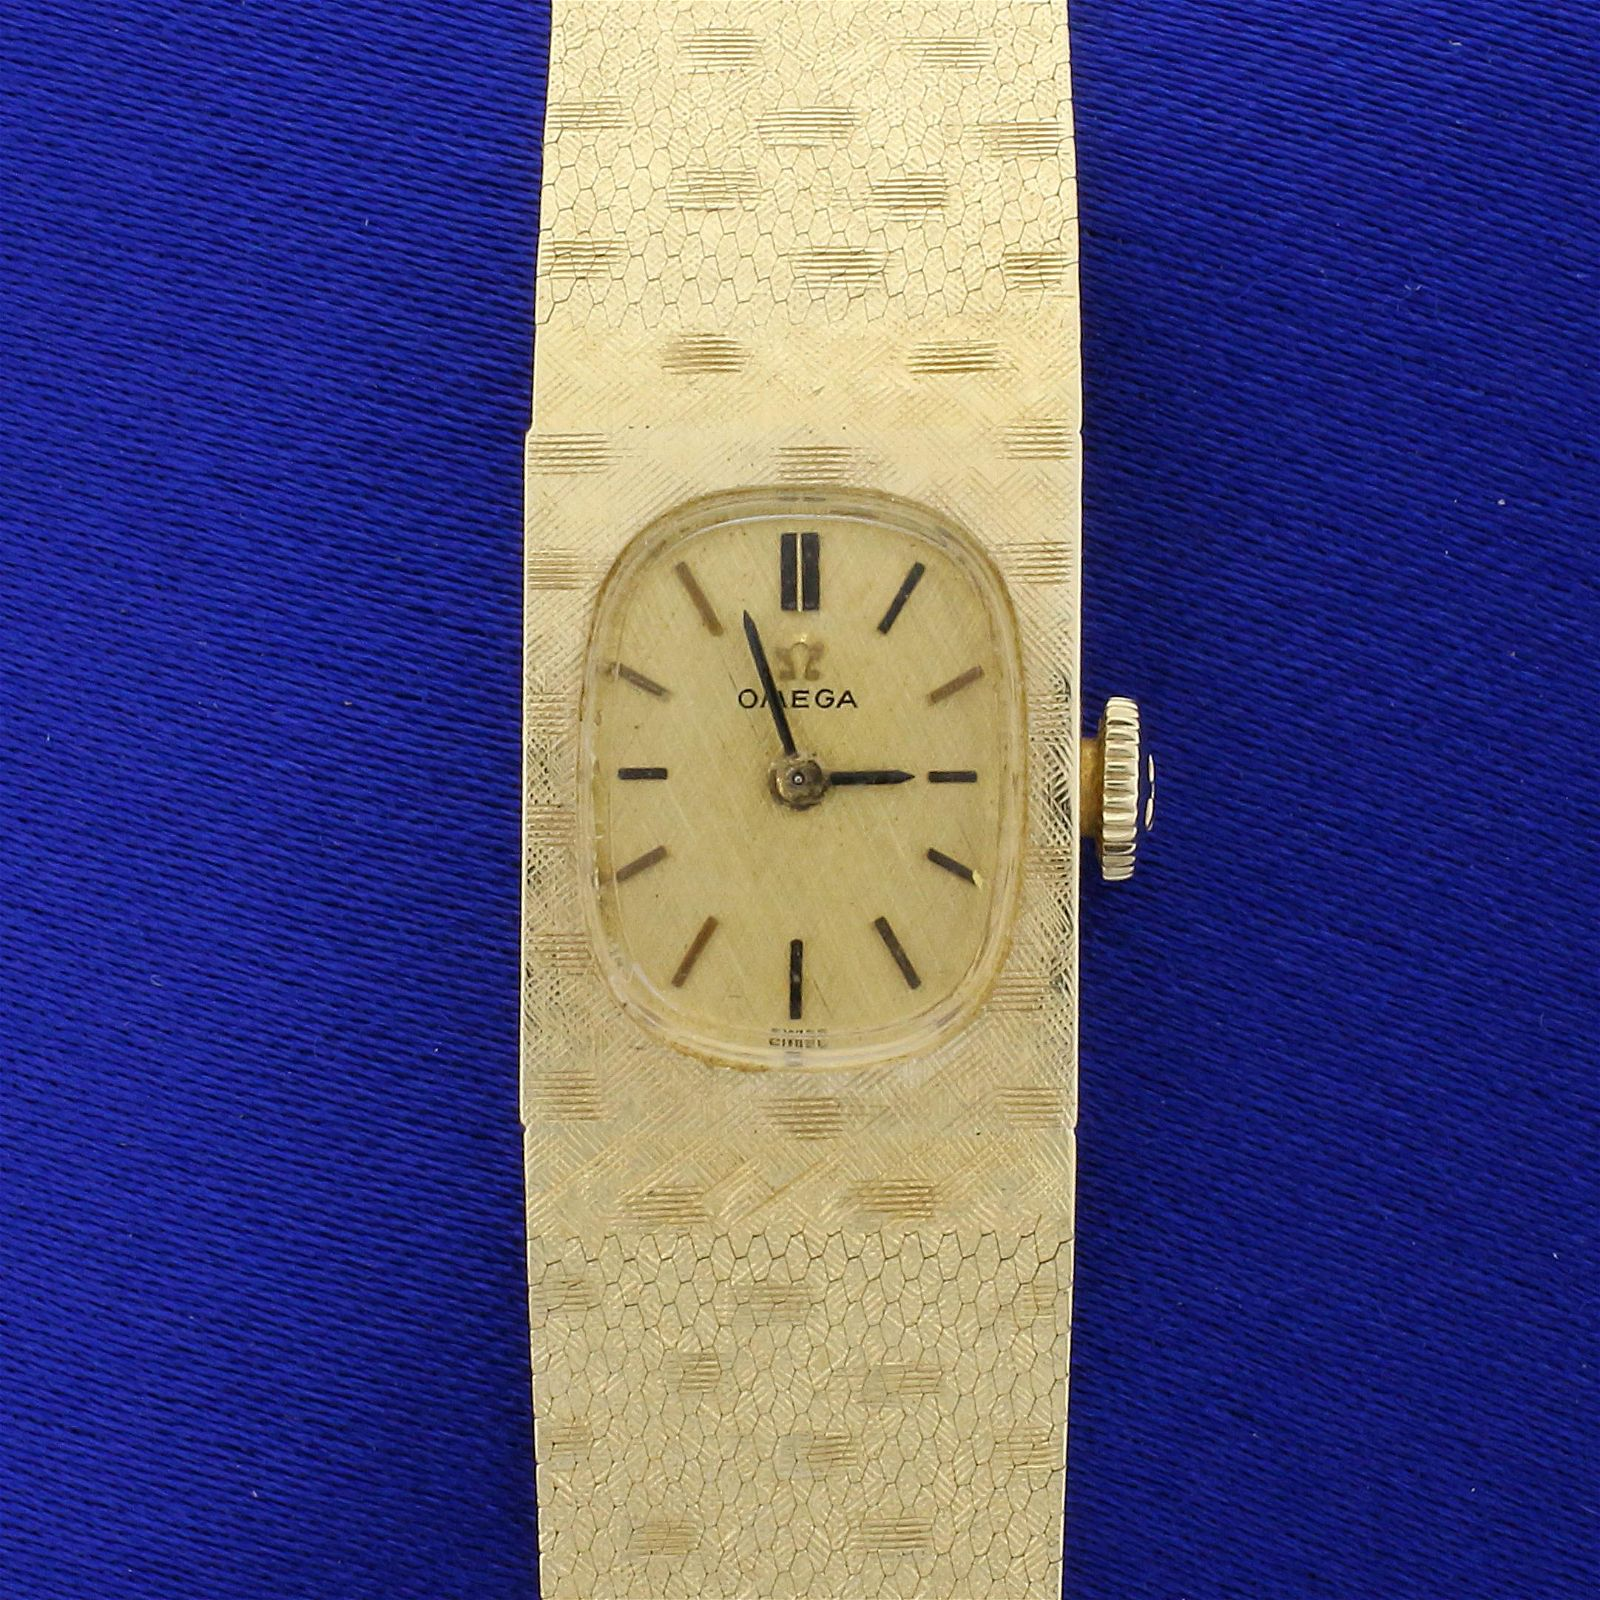 Vintage Omega Ladies Wristwatch Model AA8949 in Solid